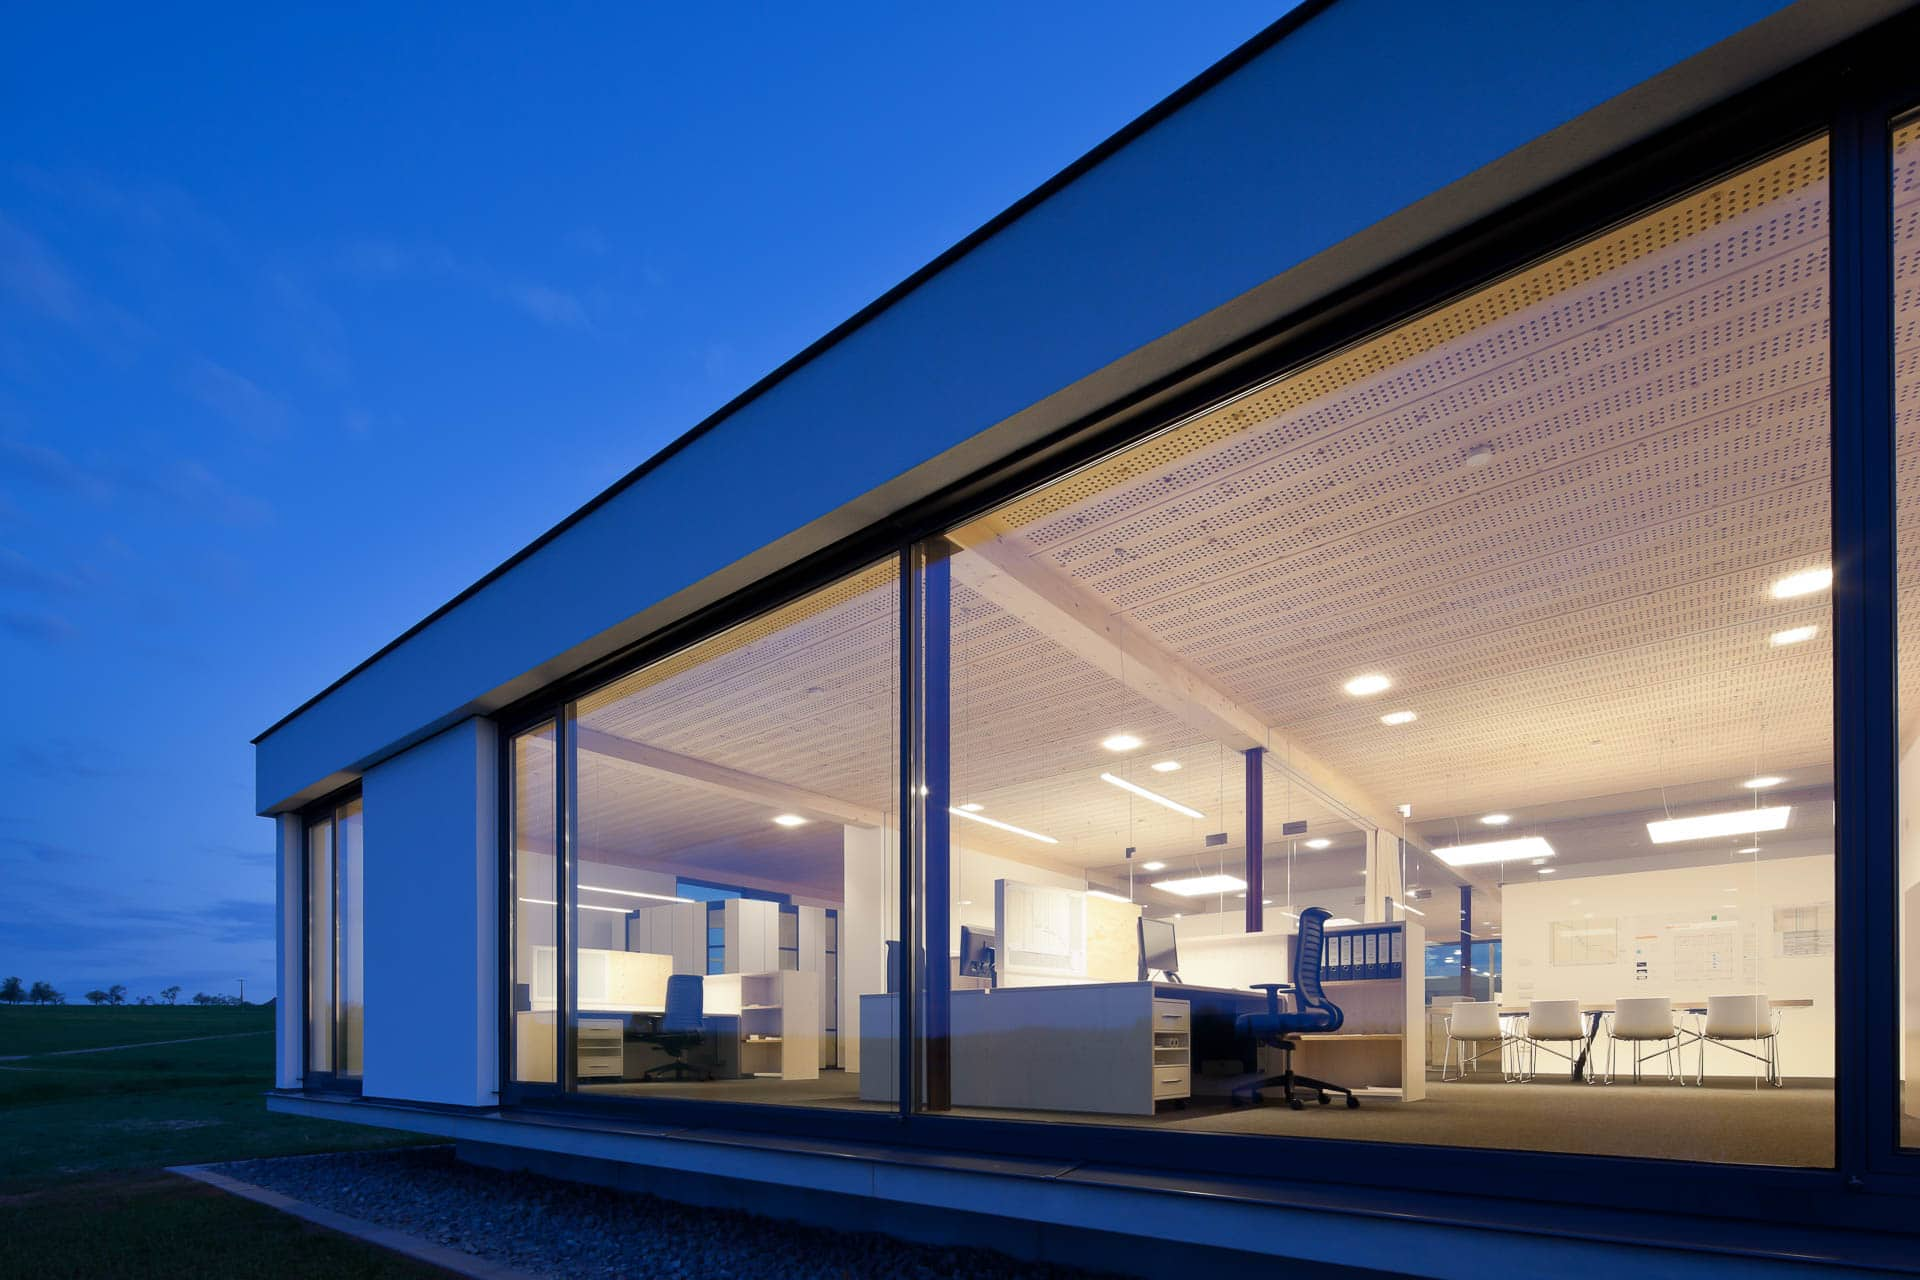 Fotografie Architekturbüro